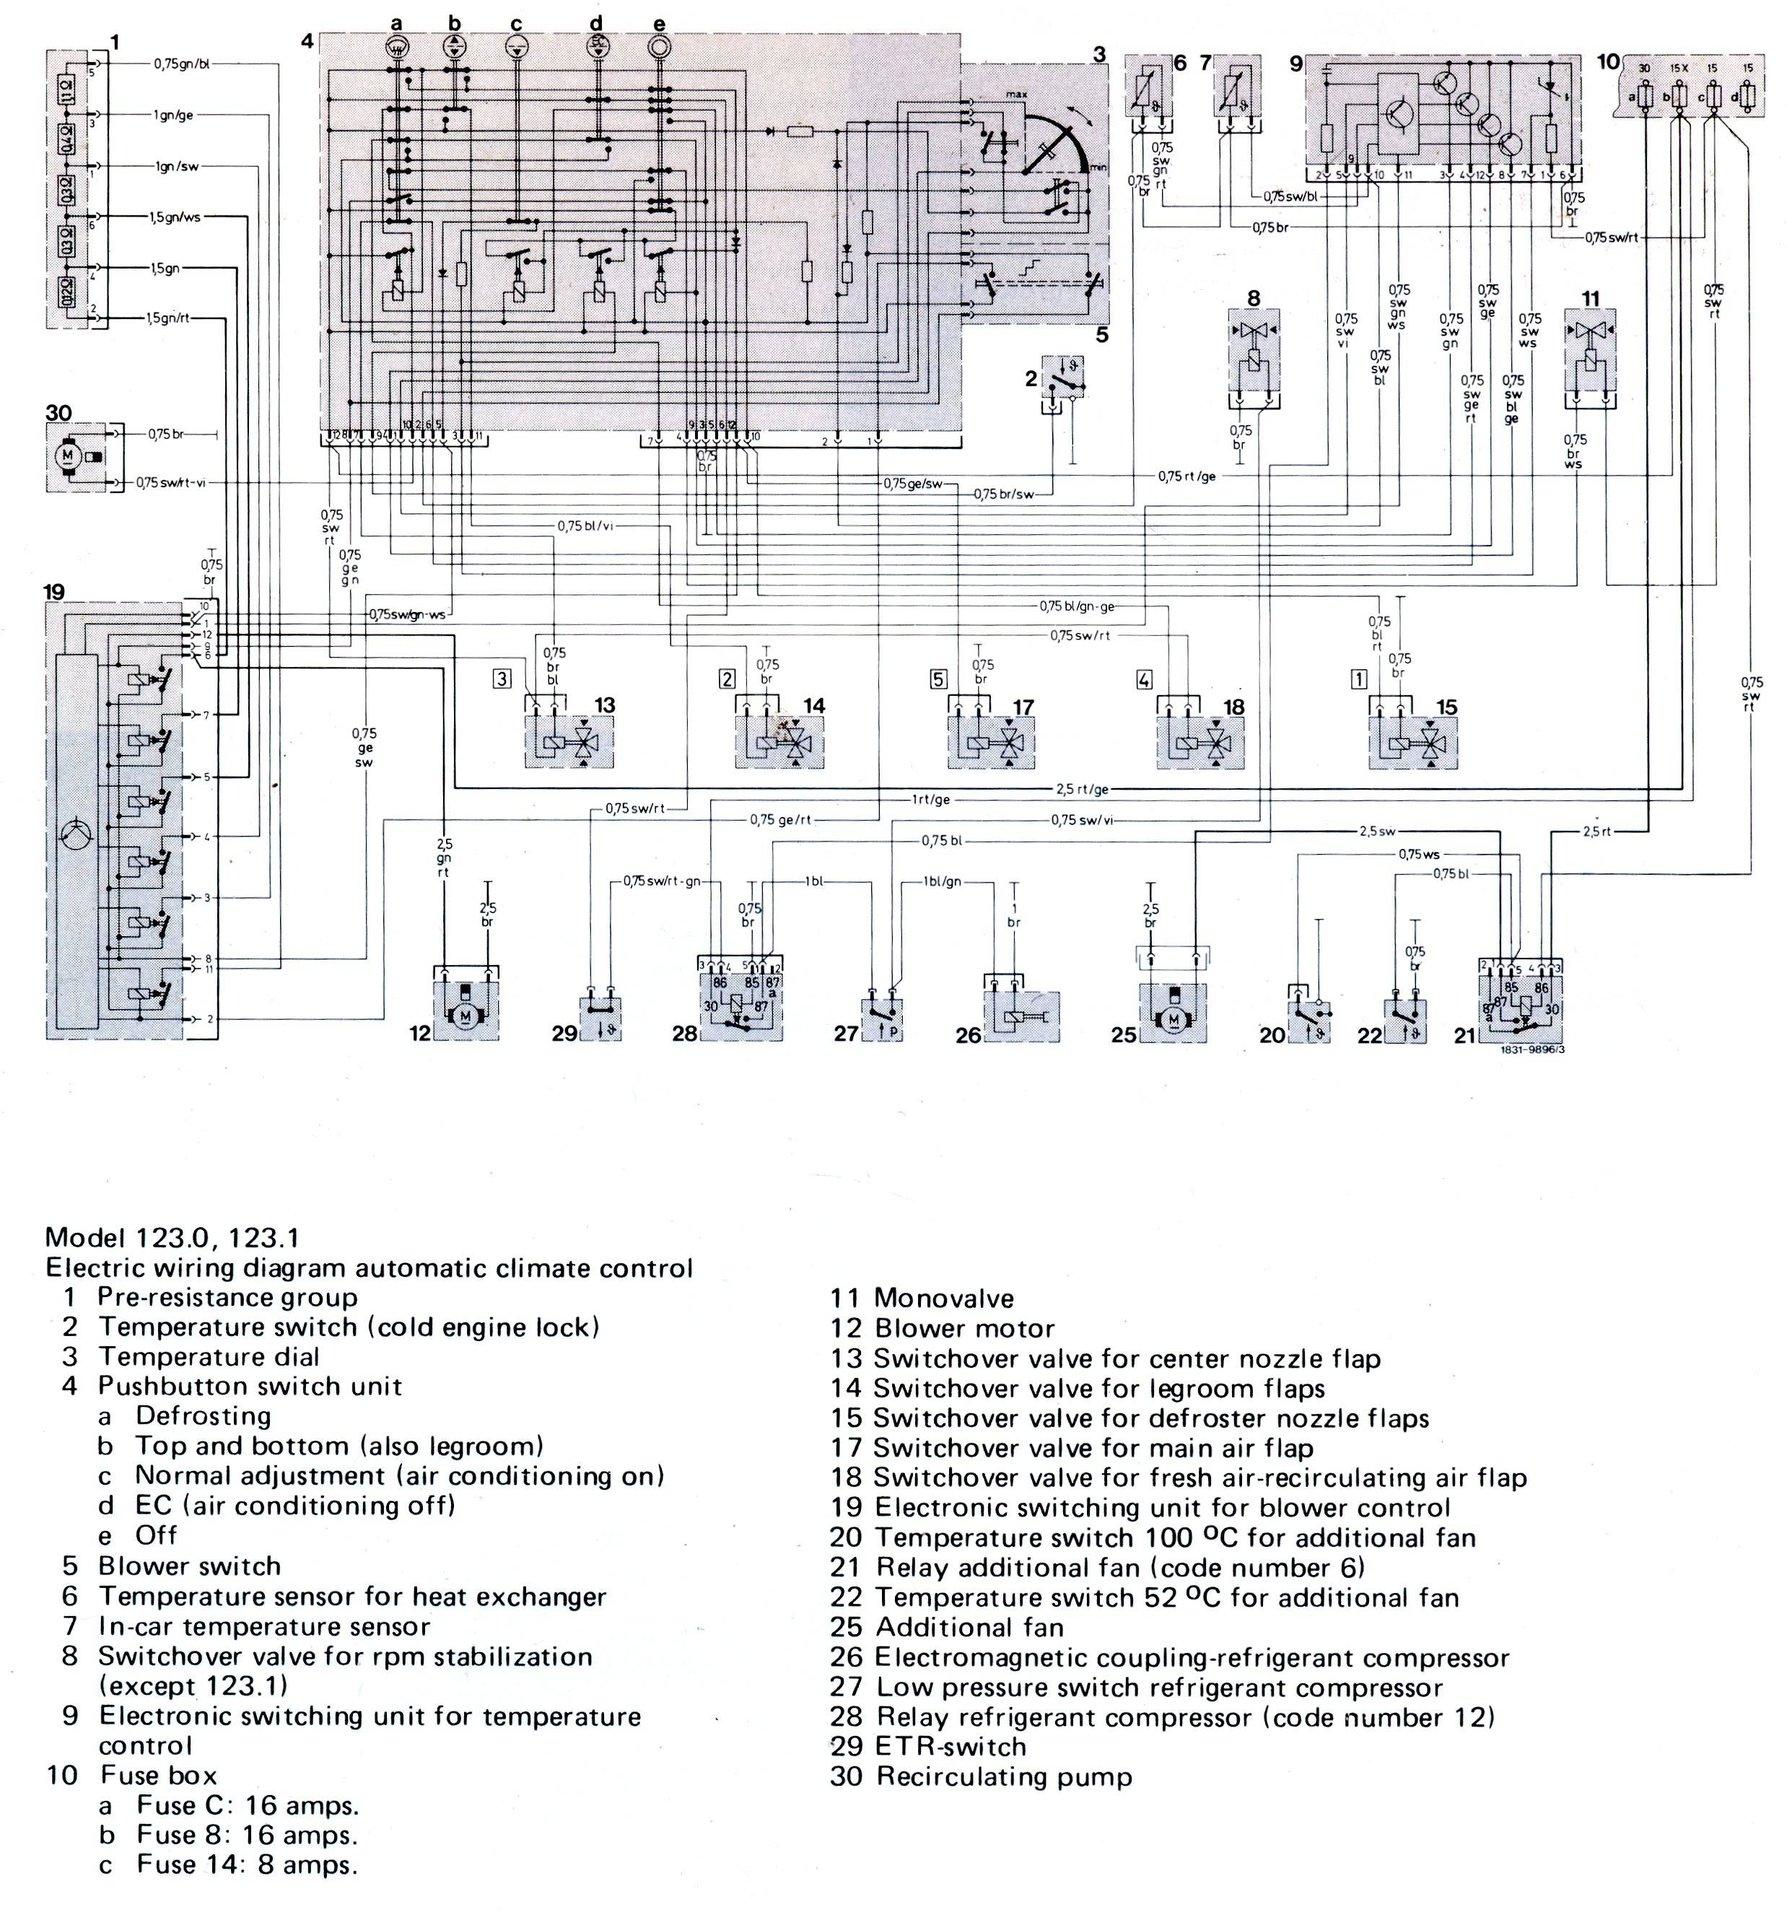 [DIAGRAM_3US]  A4E960 Mercedes 300d Window Switch Wiring Diagram | Wiring Library | Mercedes 300d Window Switch Wiring Diagram |  | Wiring Library